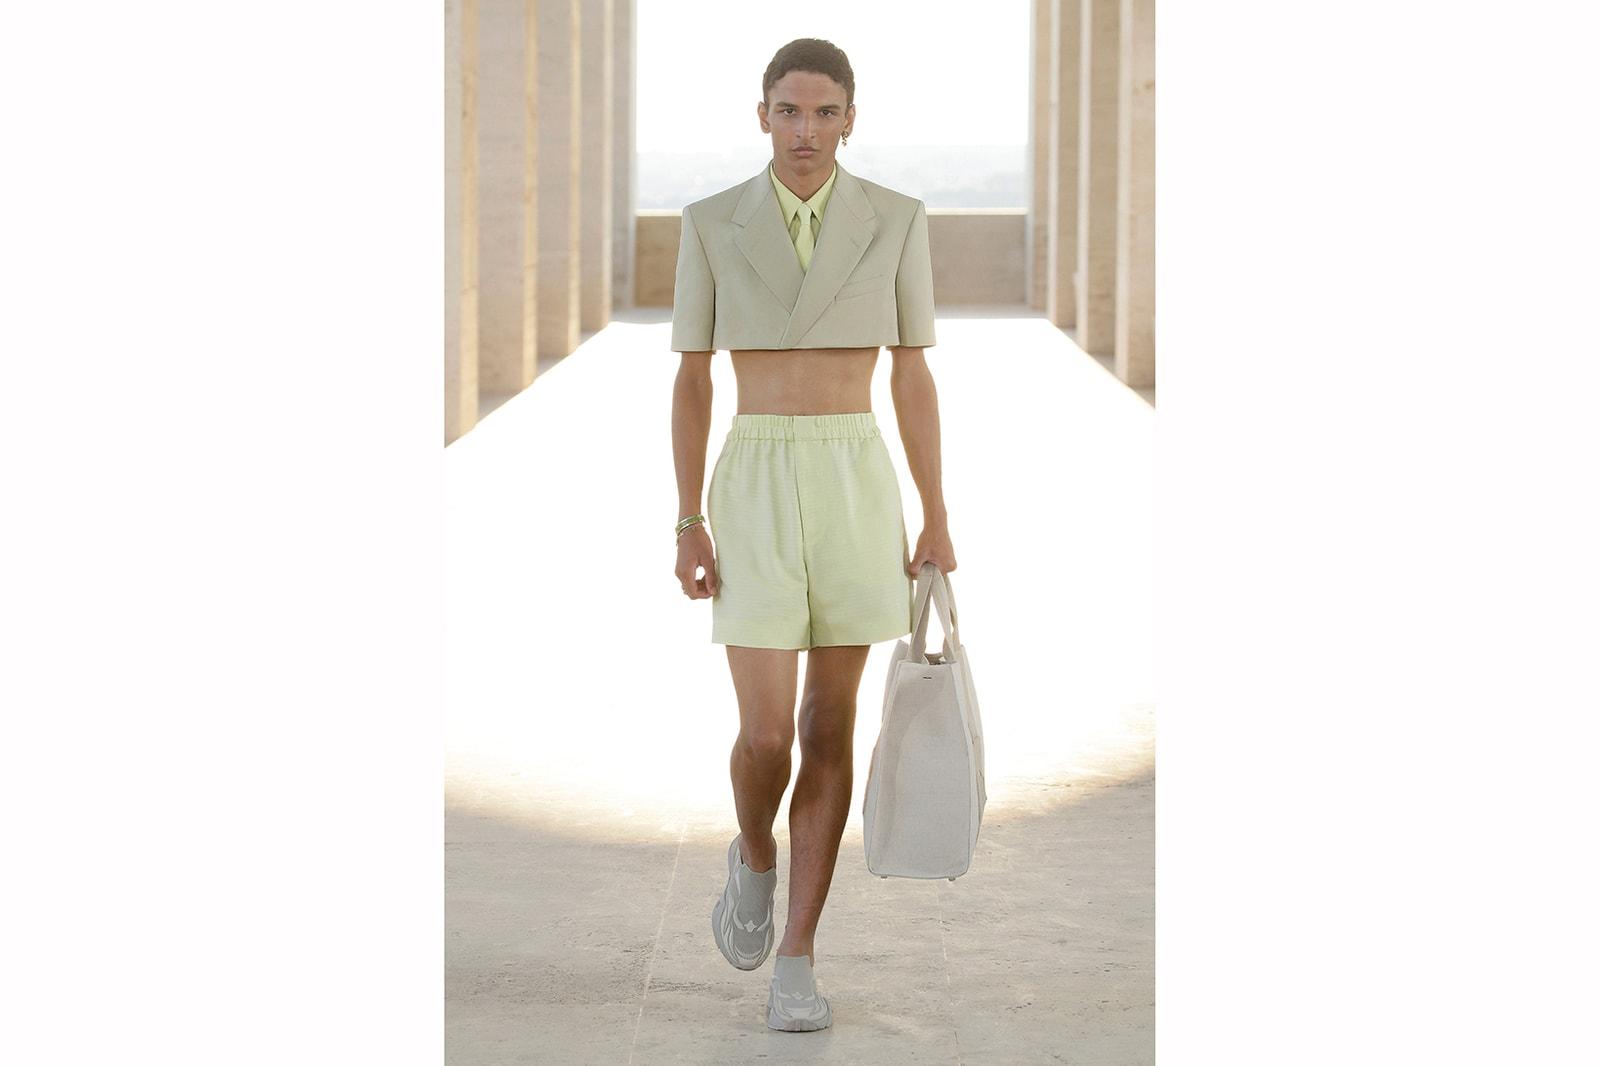 Prada Fendi Spring/Summer 2022 Menswear Collection